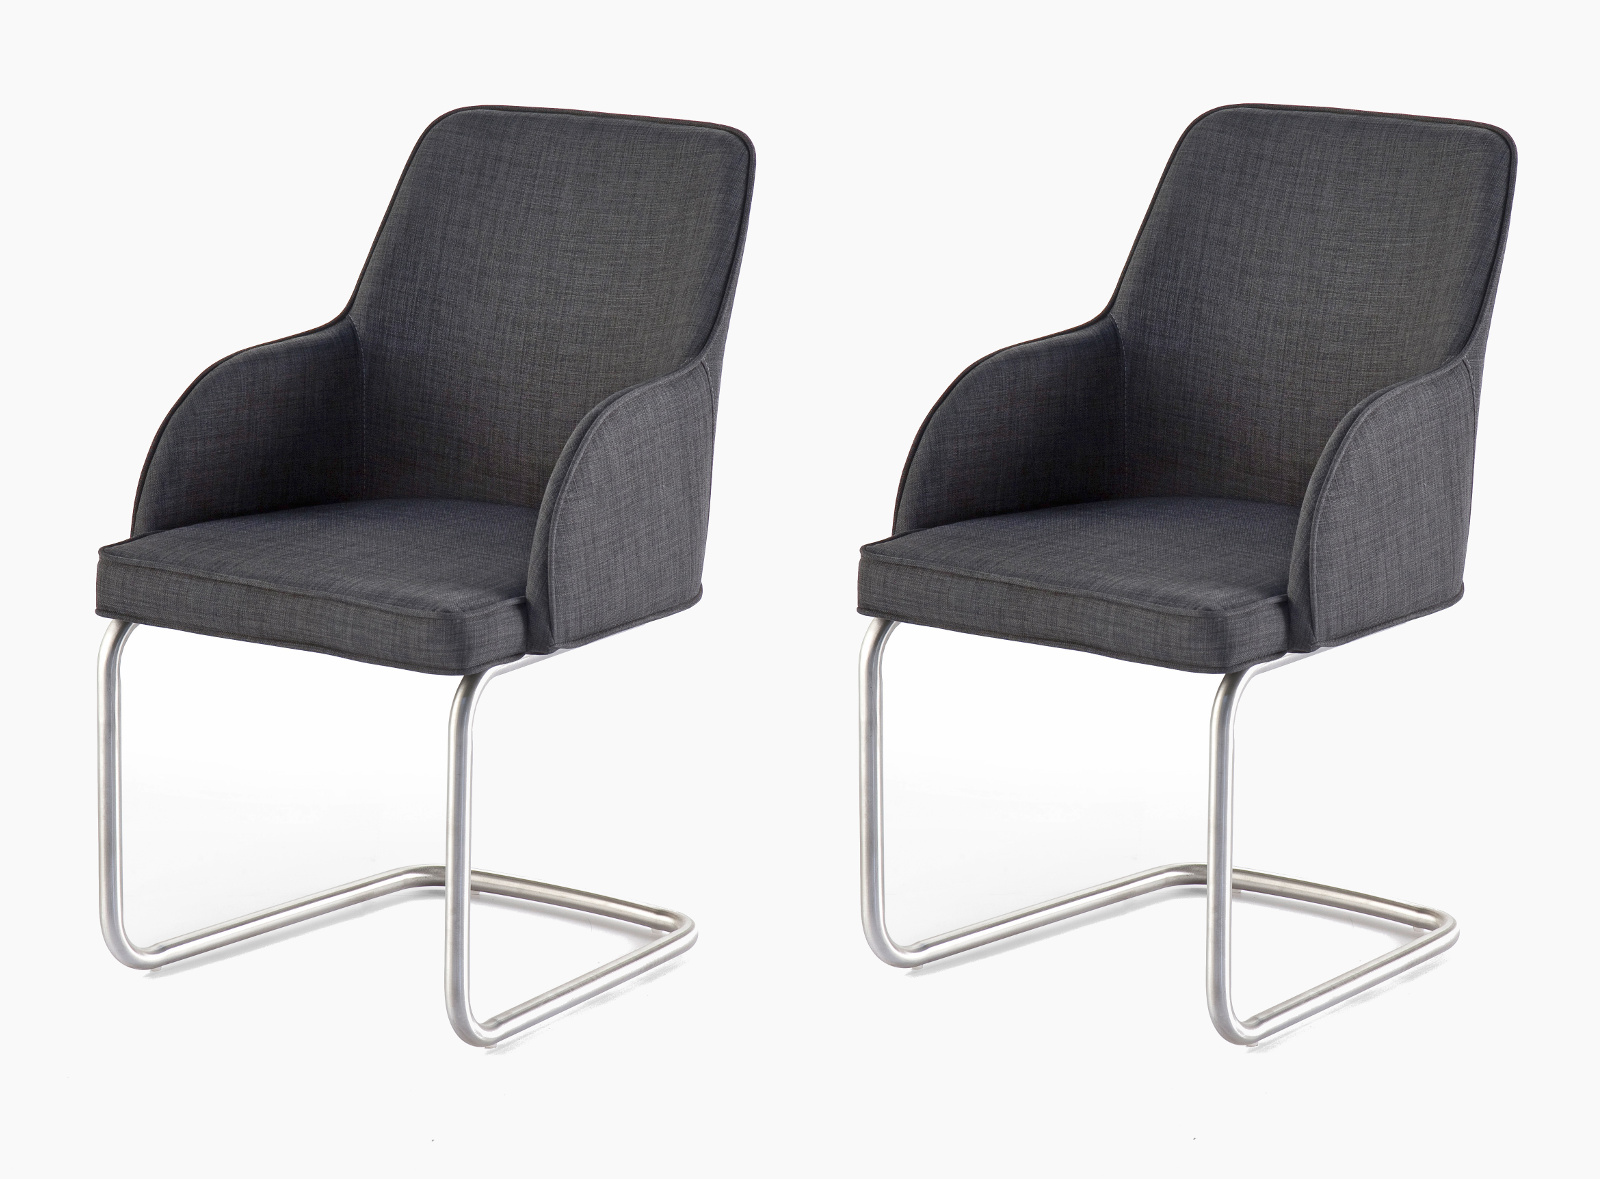 2 X Stuhl Elara Grau Schwinger